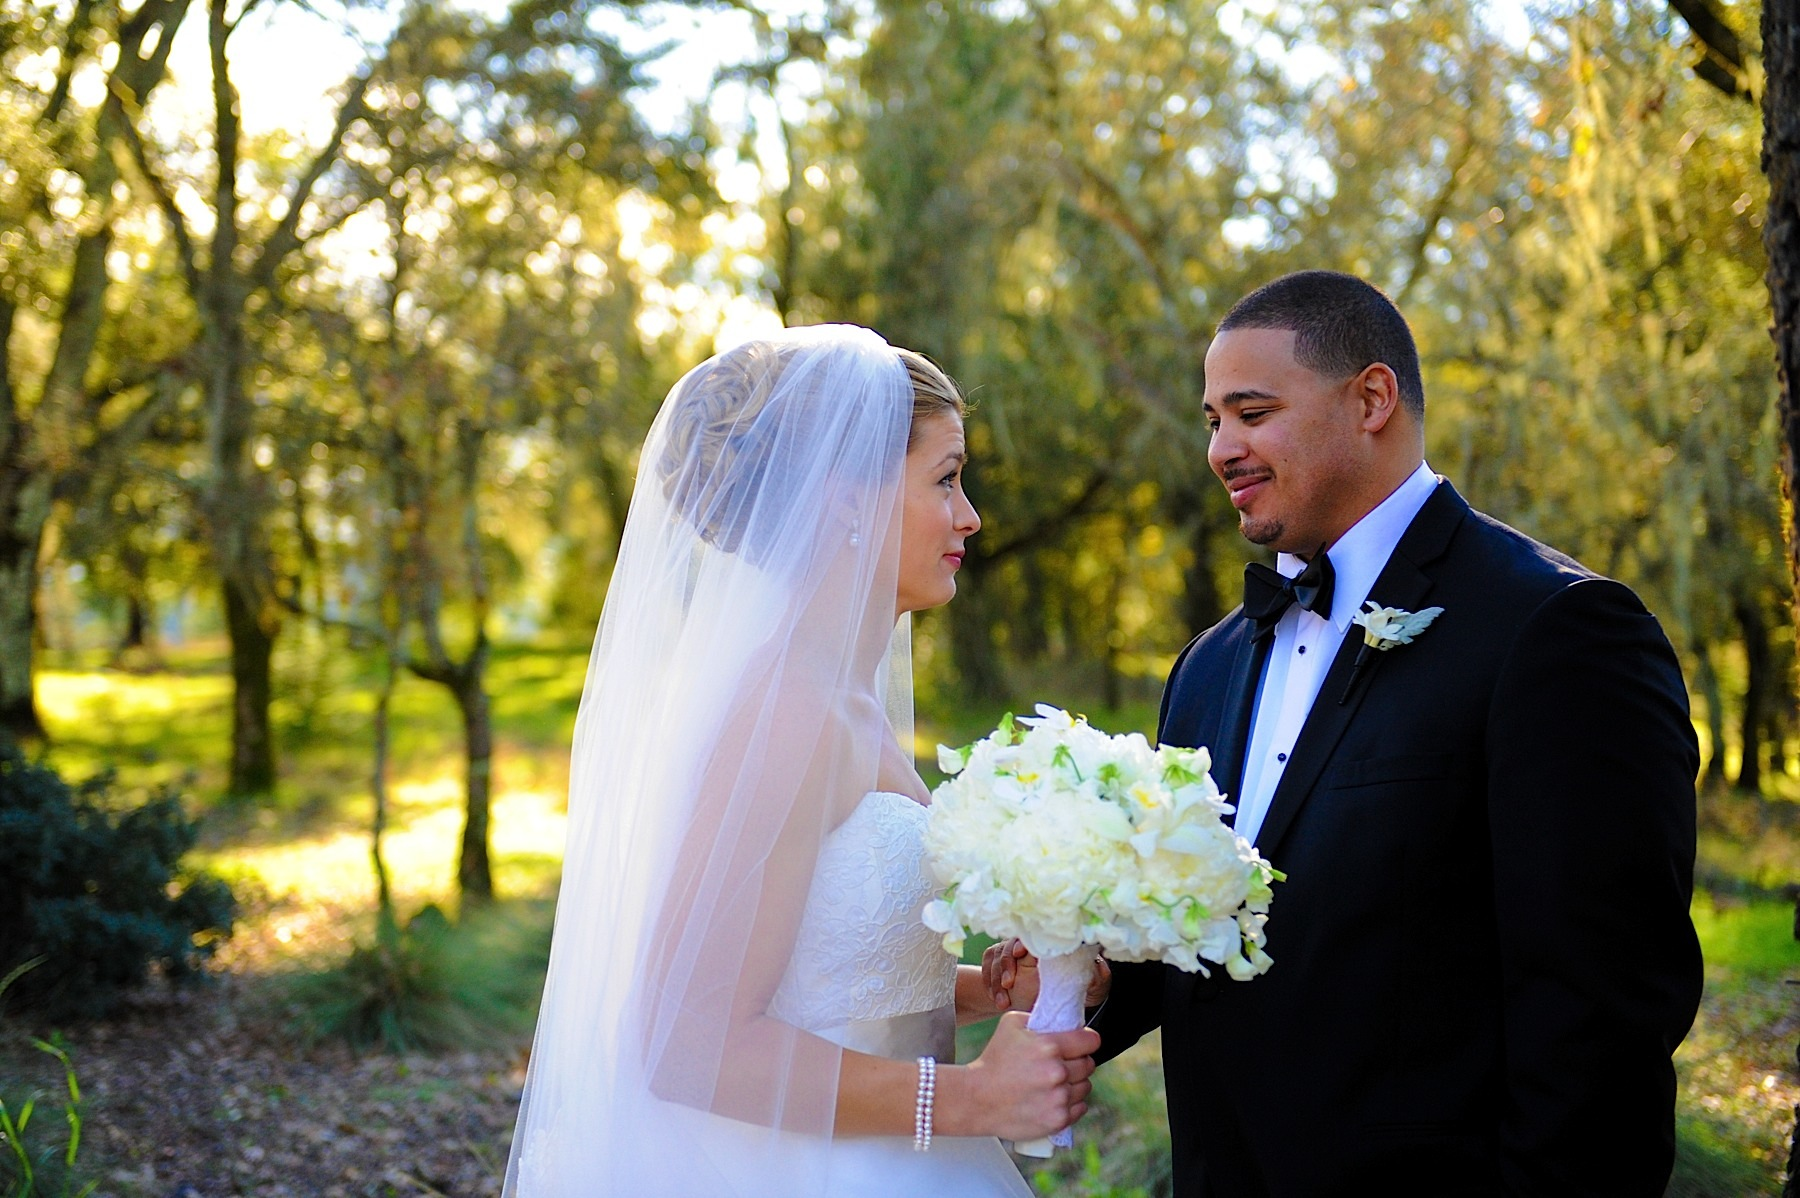 culinary_institute_of_america_napa_valley_wedding_030photographer_